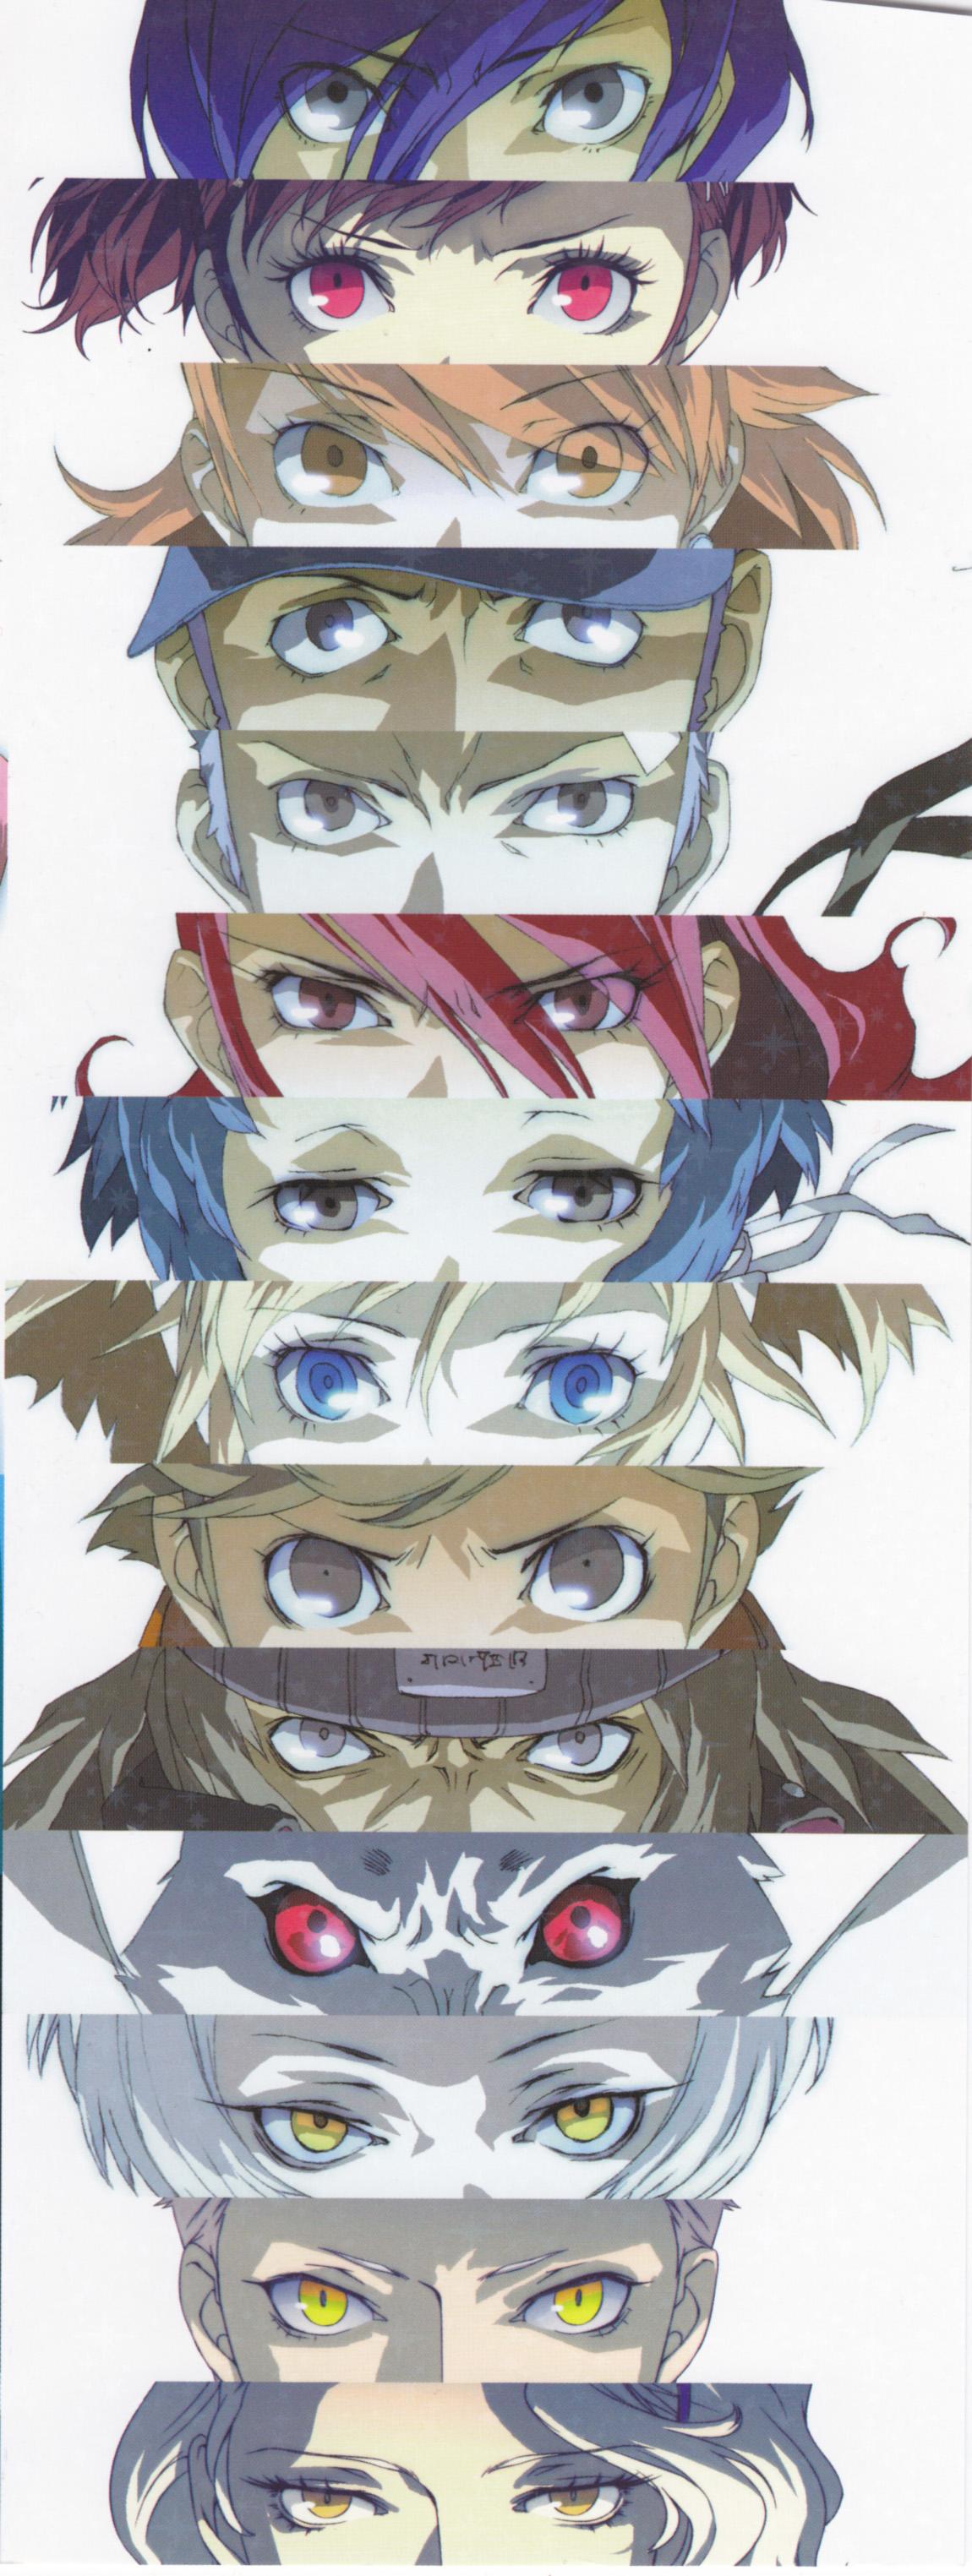 Persona 3 dating yukari takeba